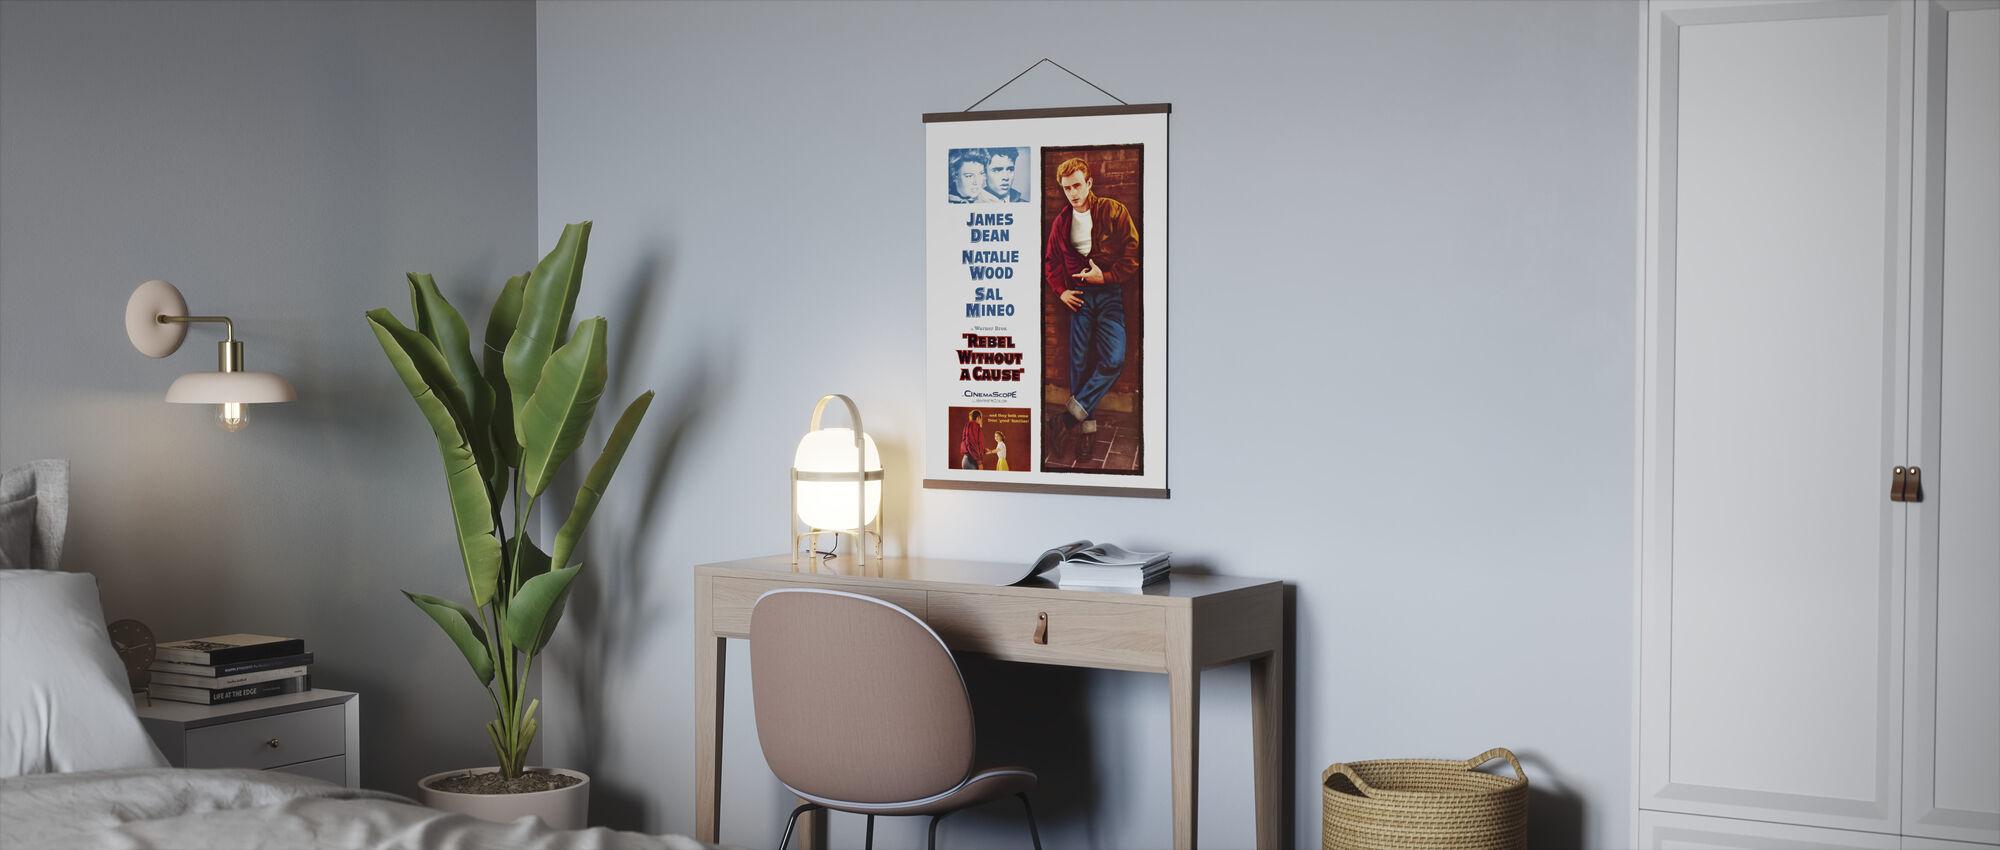 Film plakat Rebel uden en årsag - Plakat - Kontor